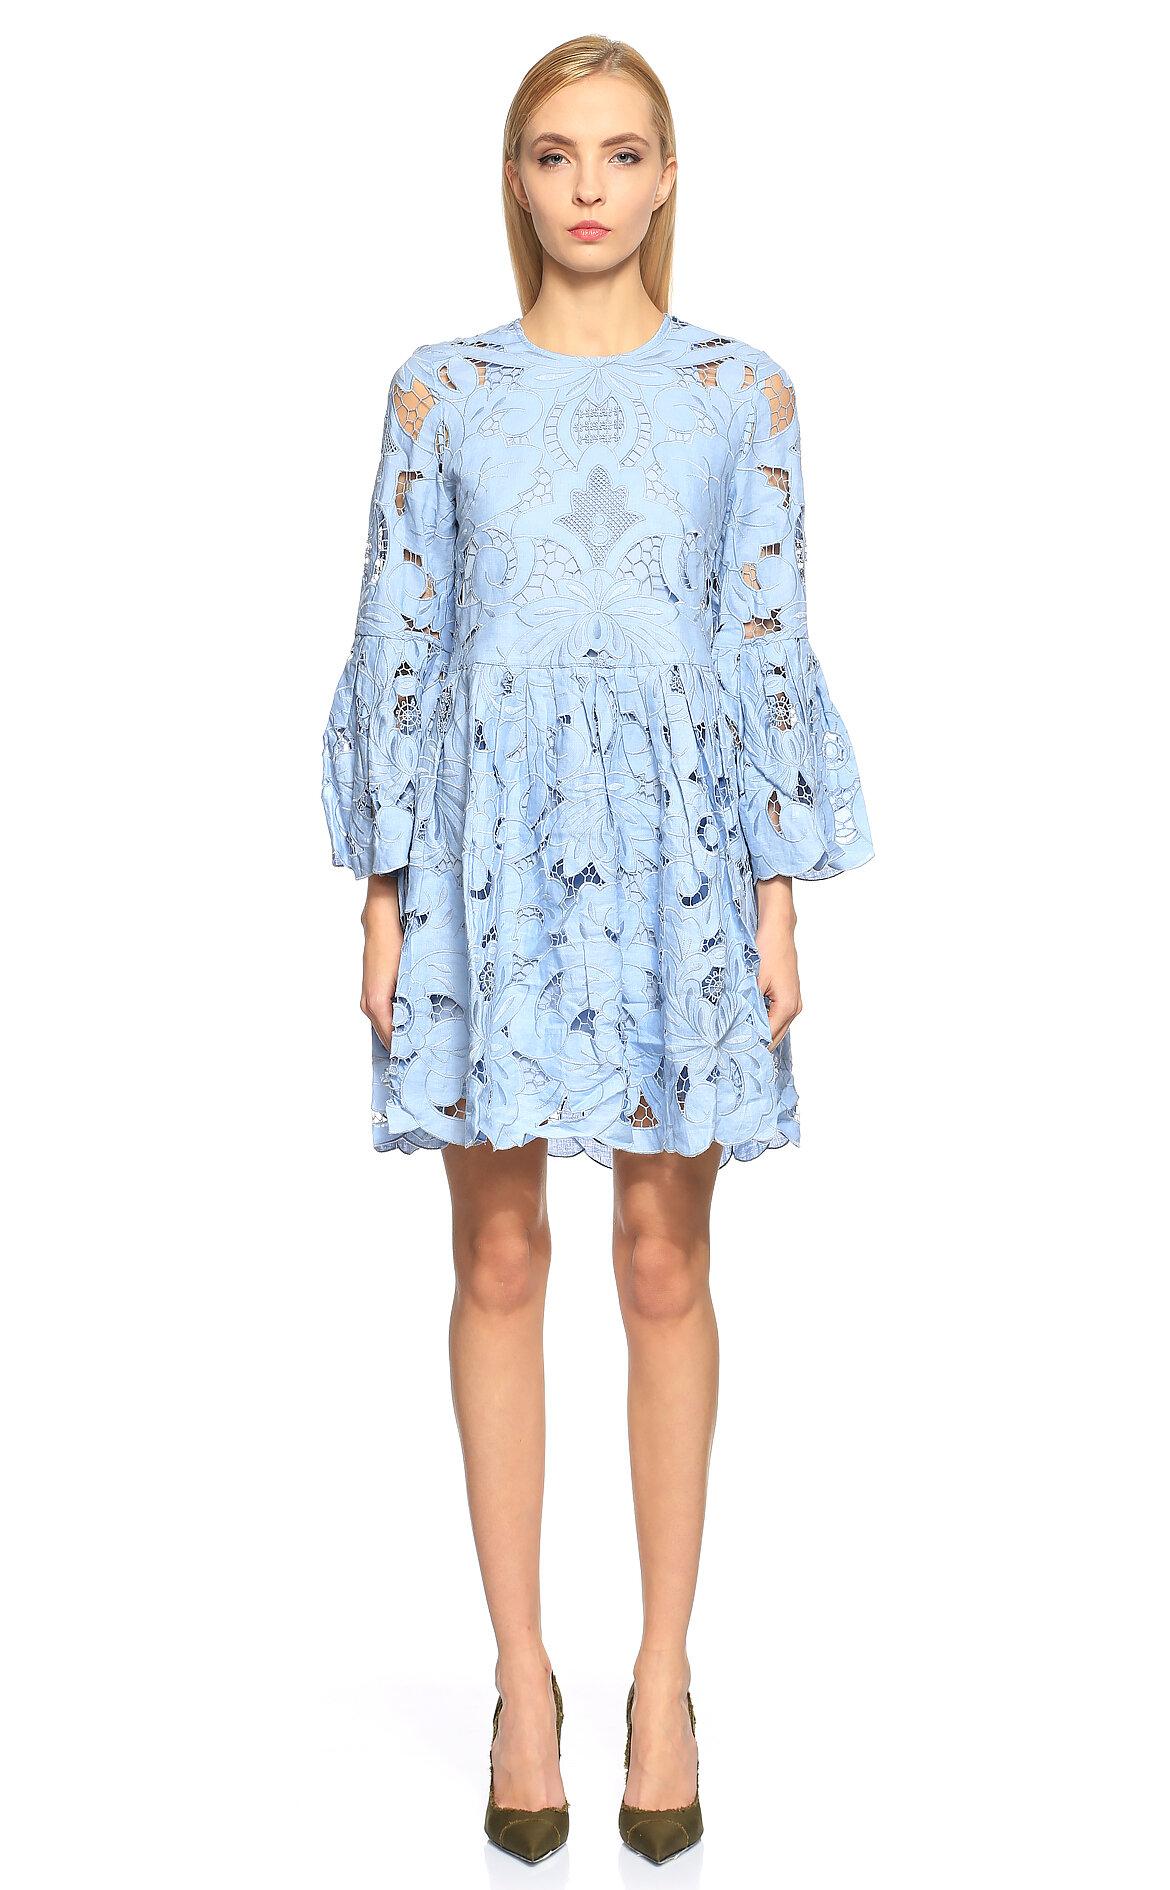 Thurley-Thurley İşleme Detaylı Mini Renkli Elbise